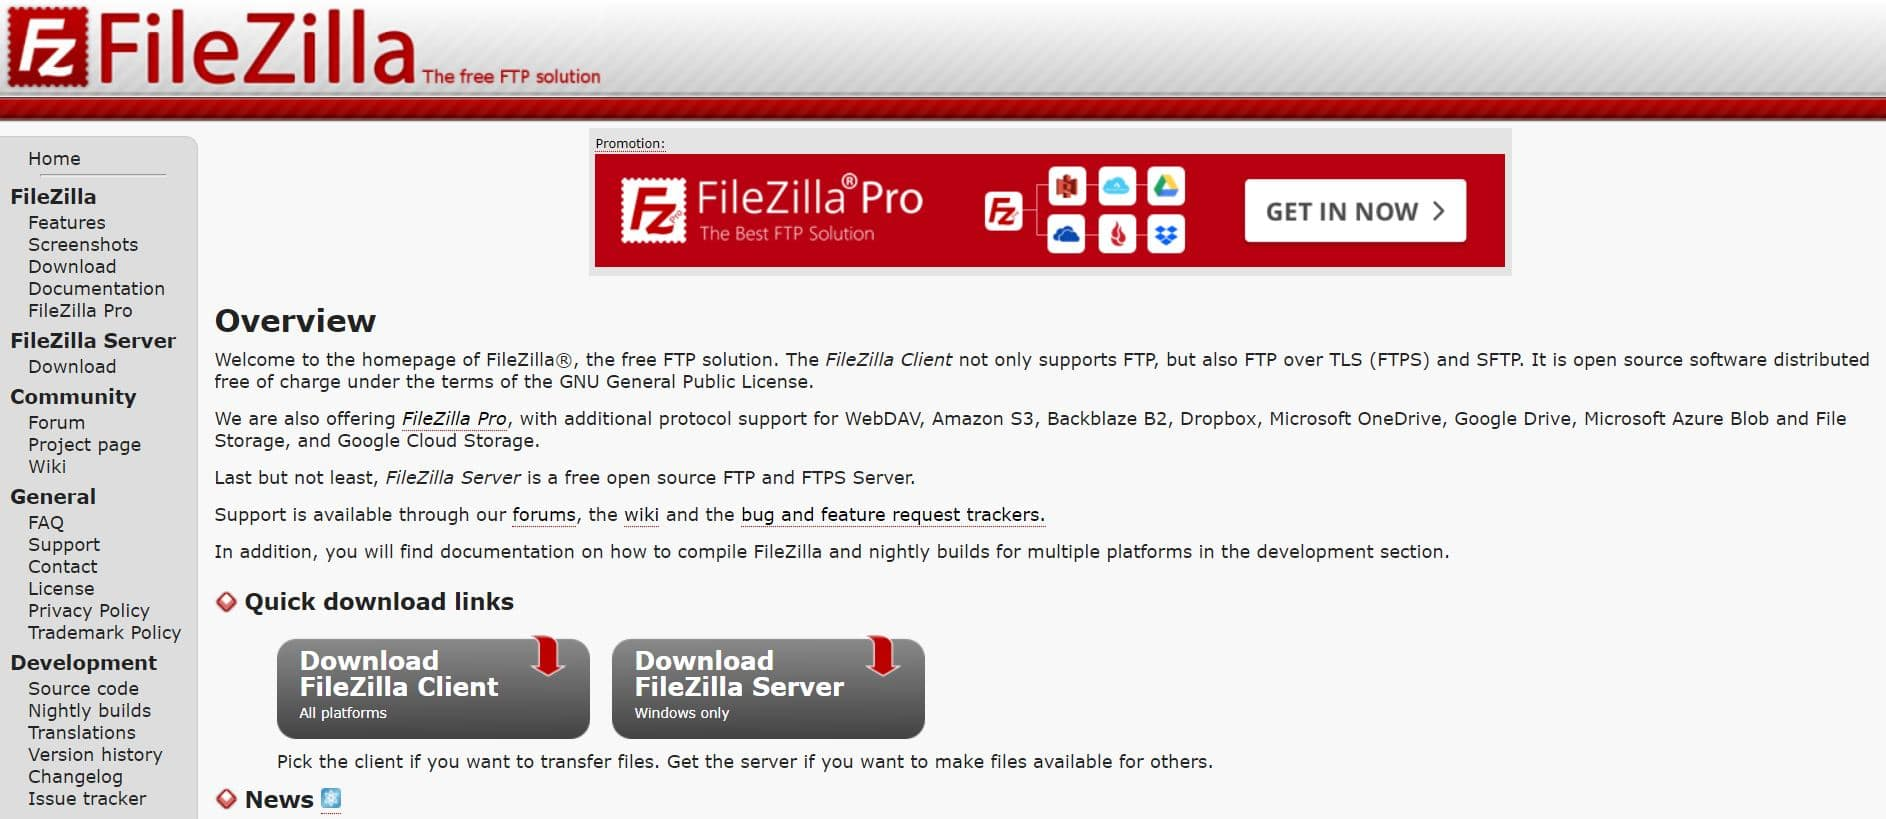 The FileZilla homepage